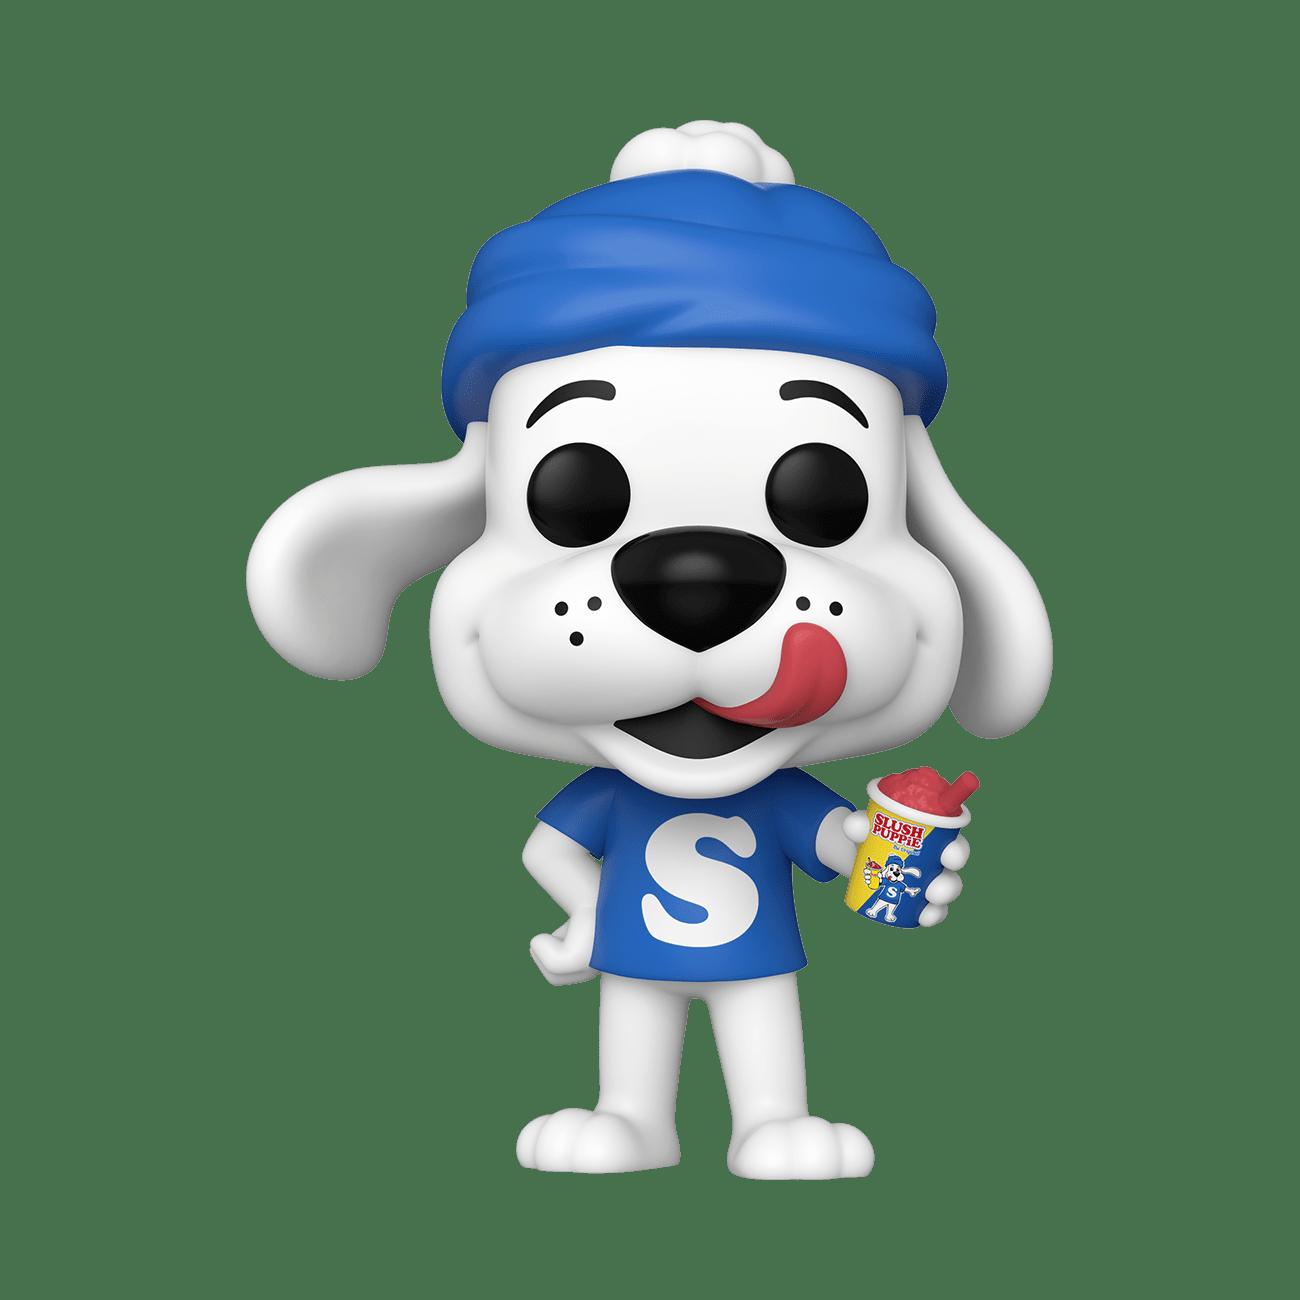 ad icons slush puppie funko